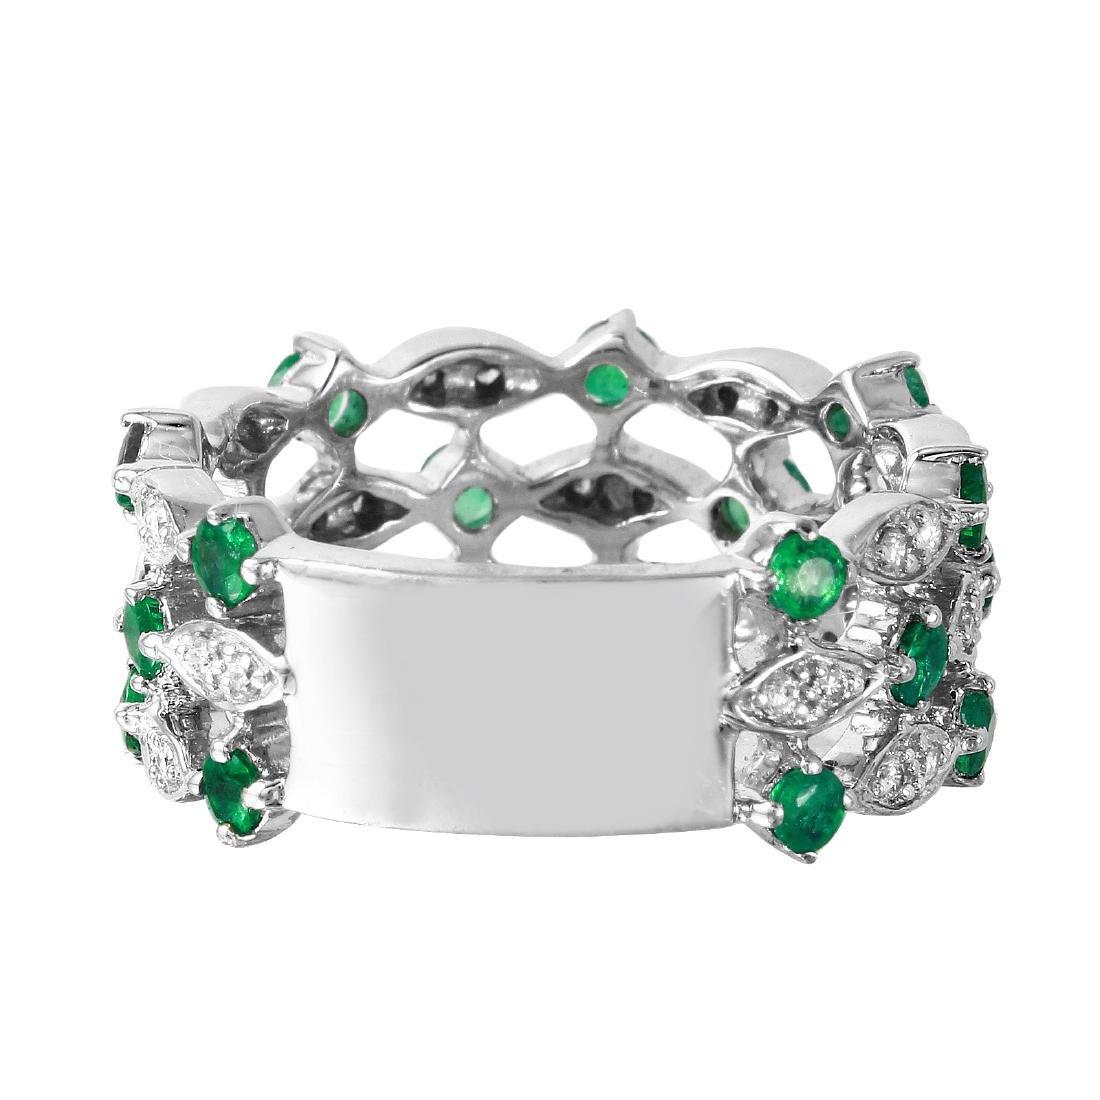 14KT White Gold 1.25ctw Emerald Diamond Ring Size 6.25 - 2